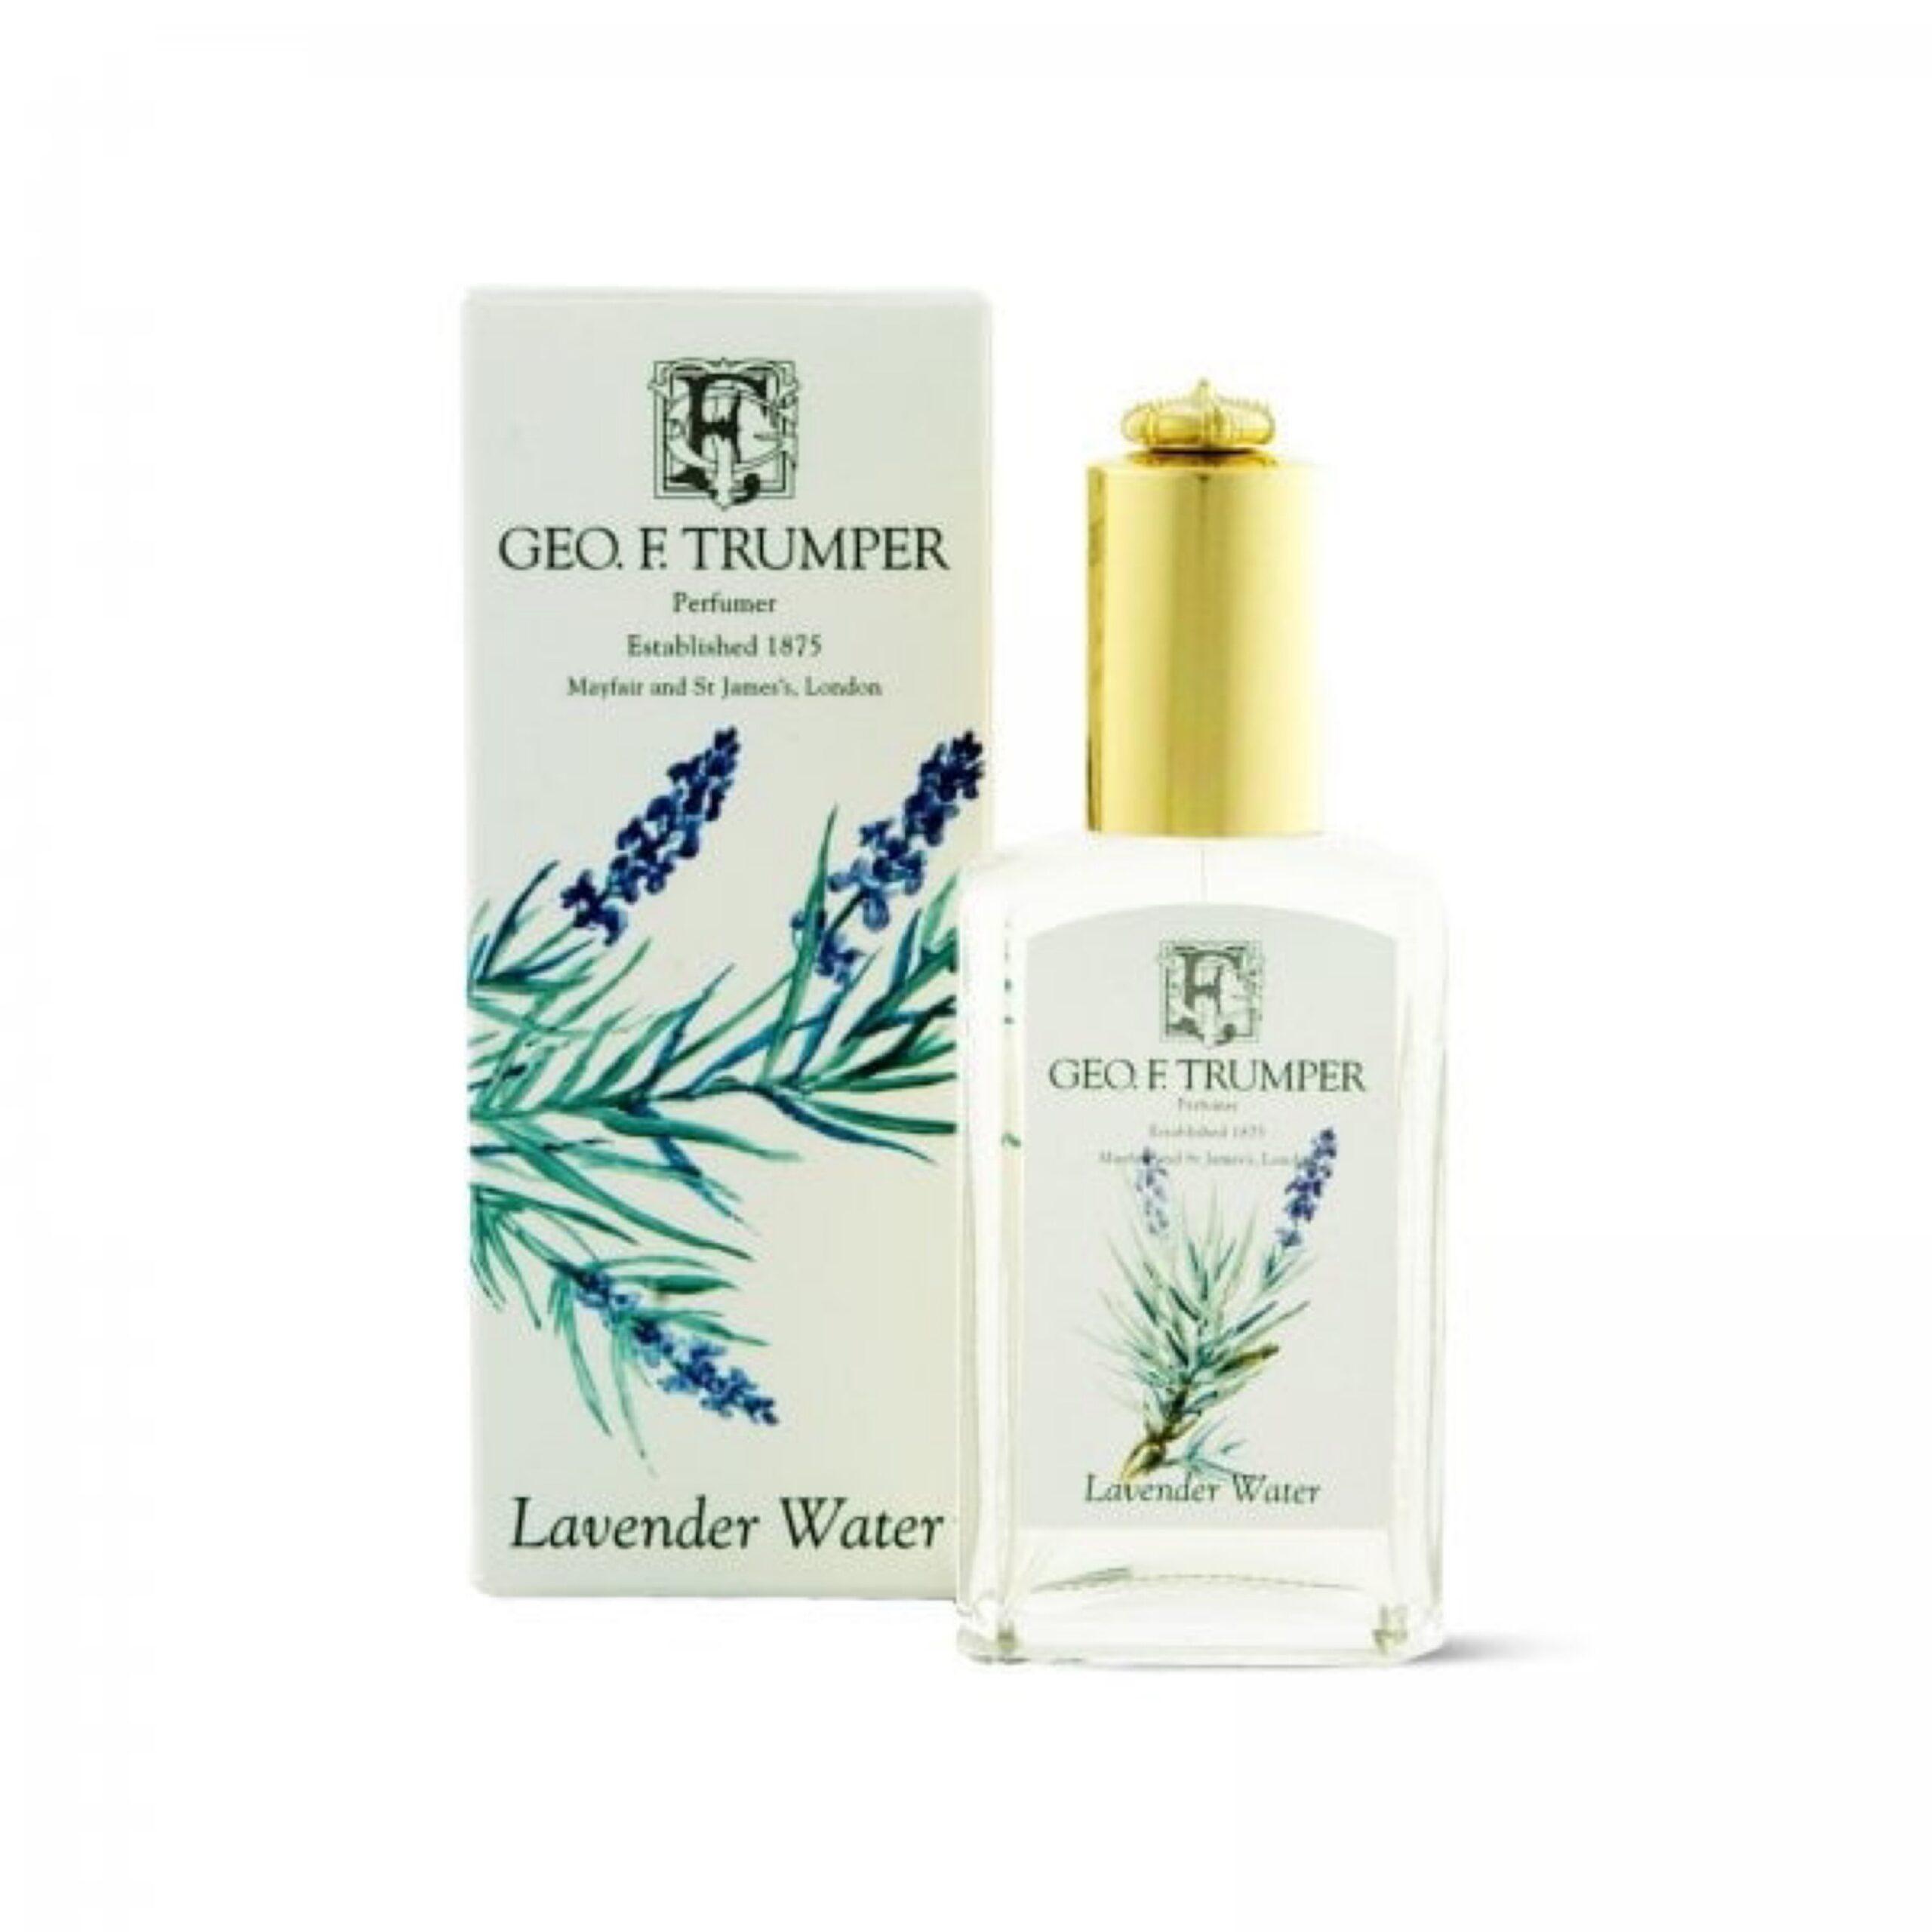 dr-tumbletys-pittsburgh-pennsylvania-allentown-hilltop-inspired-by-spirits-distilling-co-storyville-lounge-geo-f-trumper-perfumer-lavender-water-mayfair-st-james-london-uk-england-shave-shop-cologne-mens-womens-unisex-gender-neutral-perfume-petitgrain-patchouli-clary-sage-musk-geranium-eau-de-toilette-versatile-bath-body